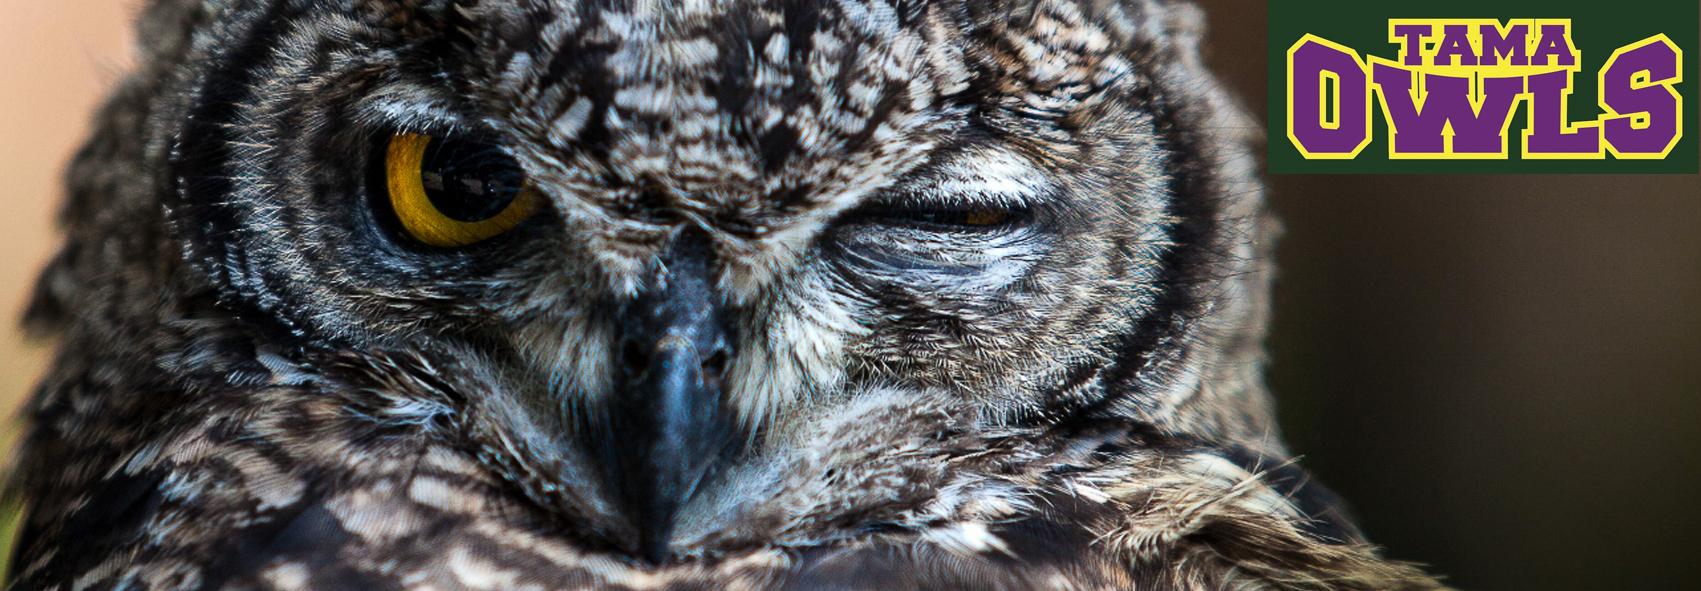 OwlsNenga2015j2